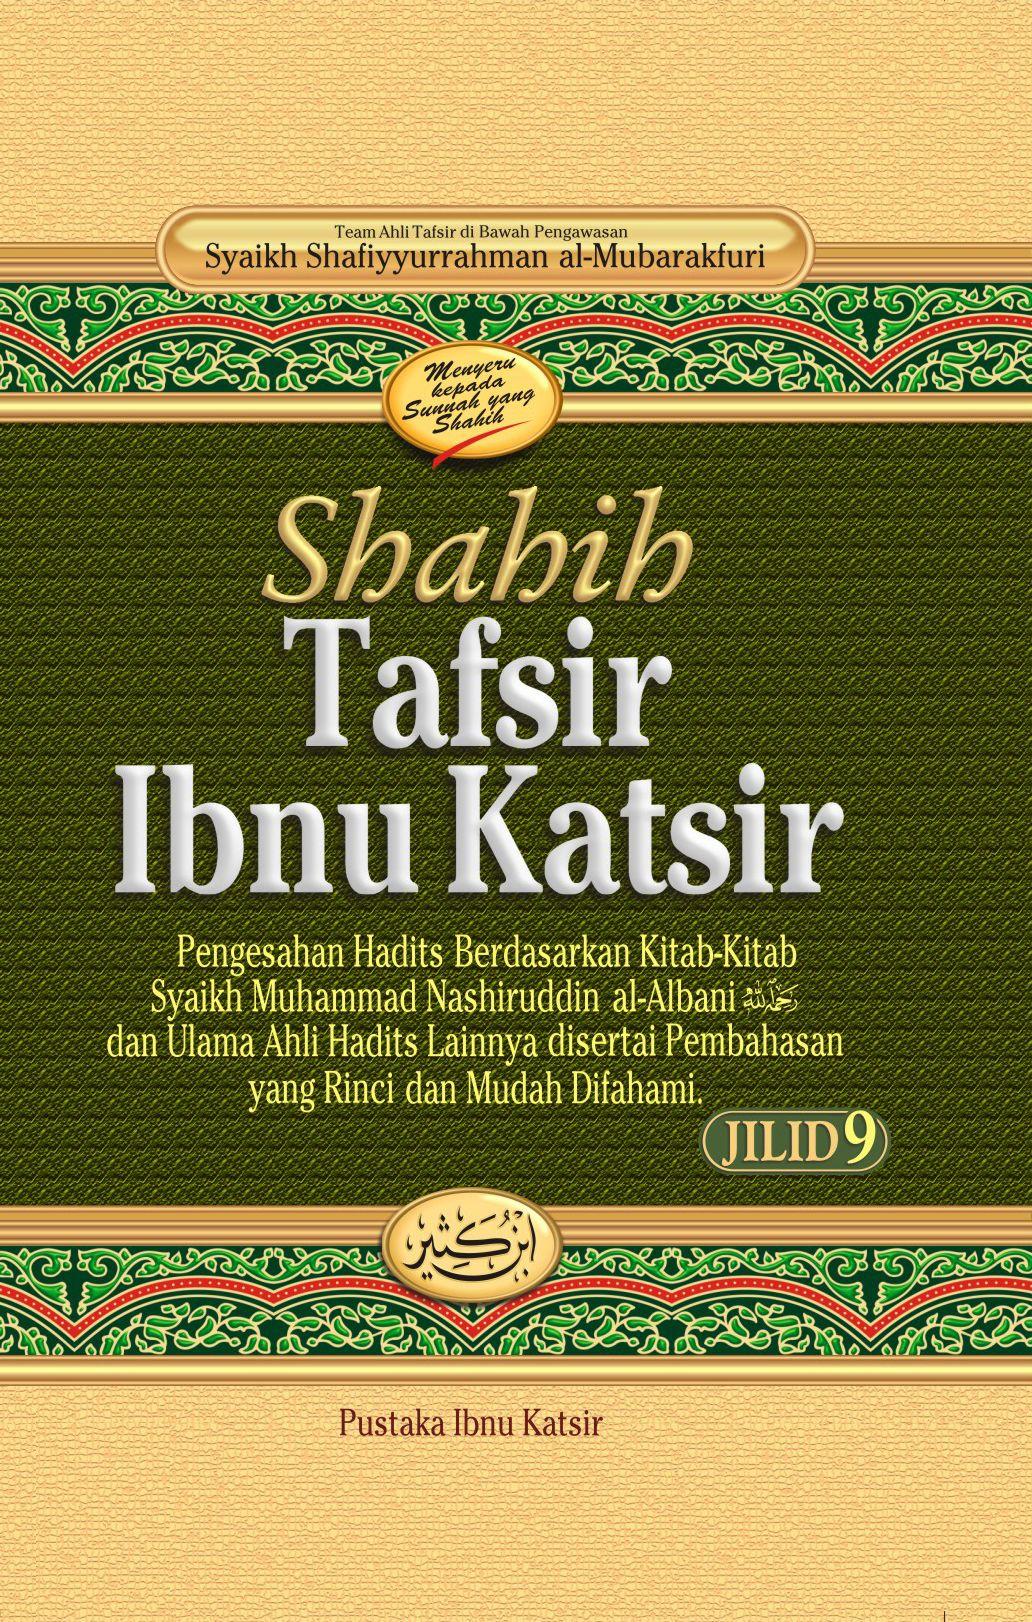 Tafsir Ibnu Katsir Indonesia Pdf